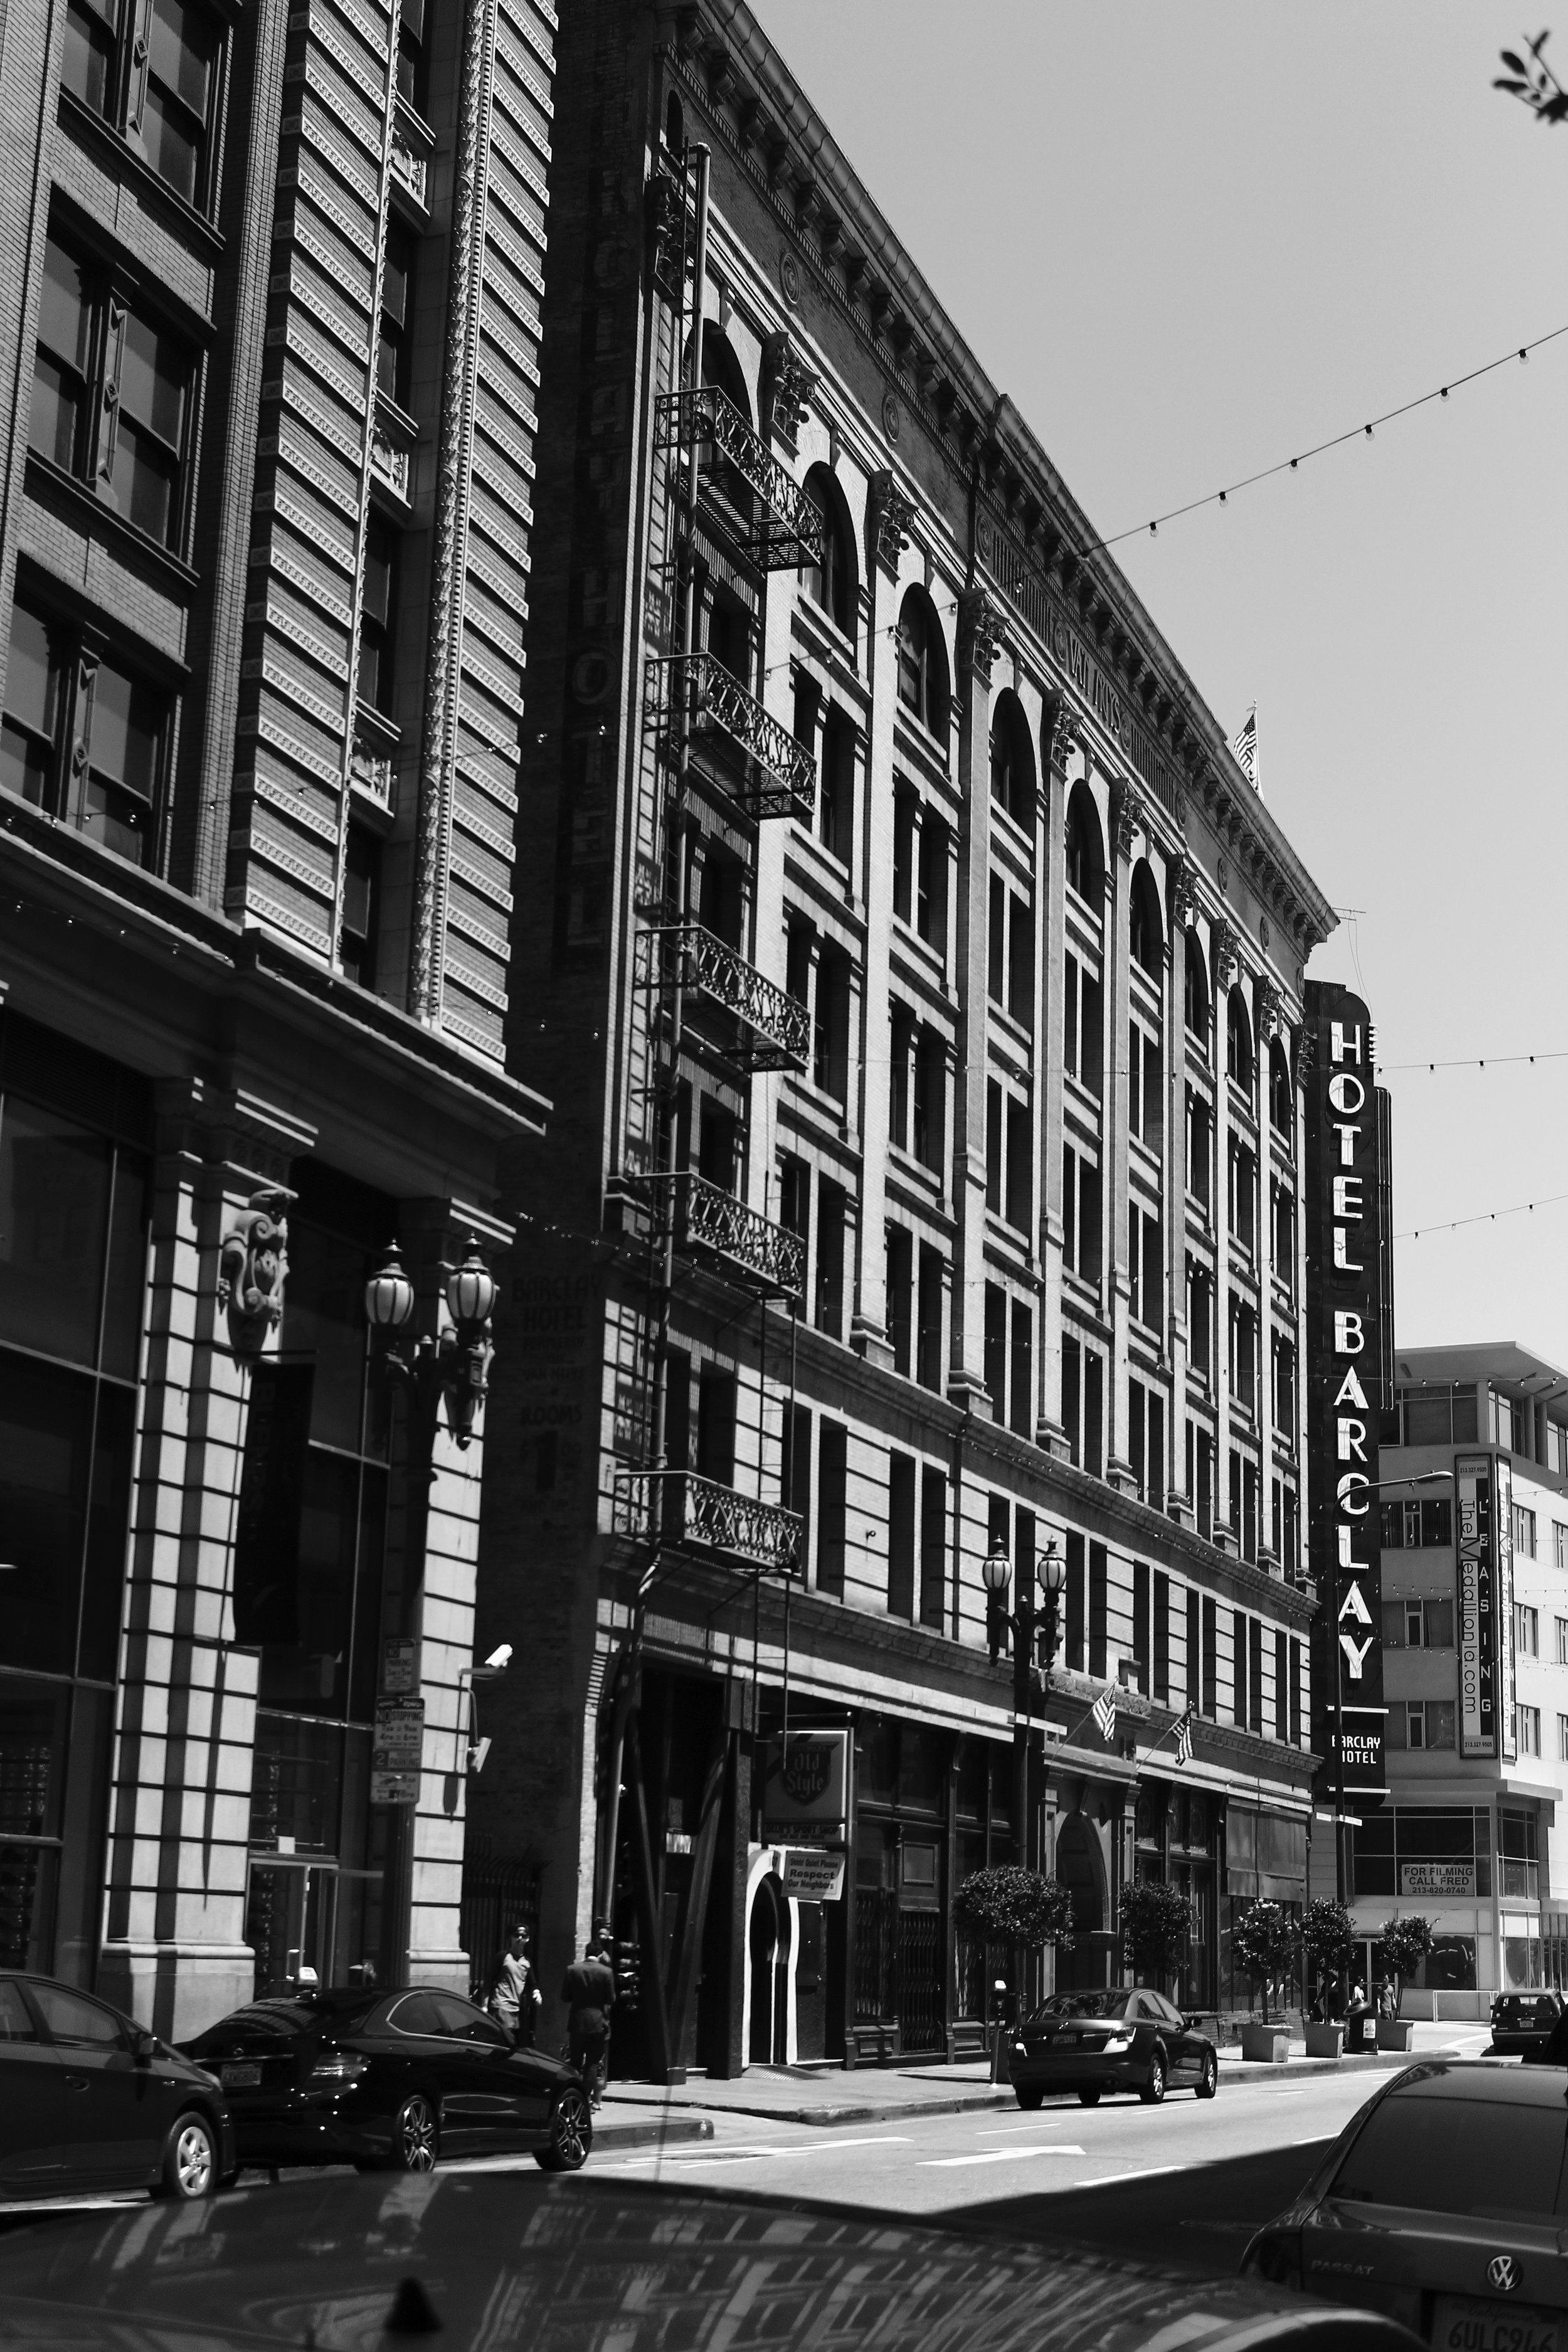 Javier, Street Photography